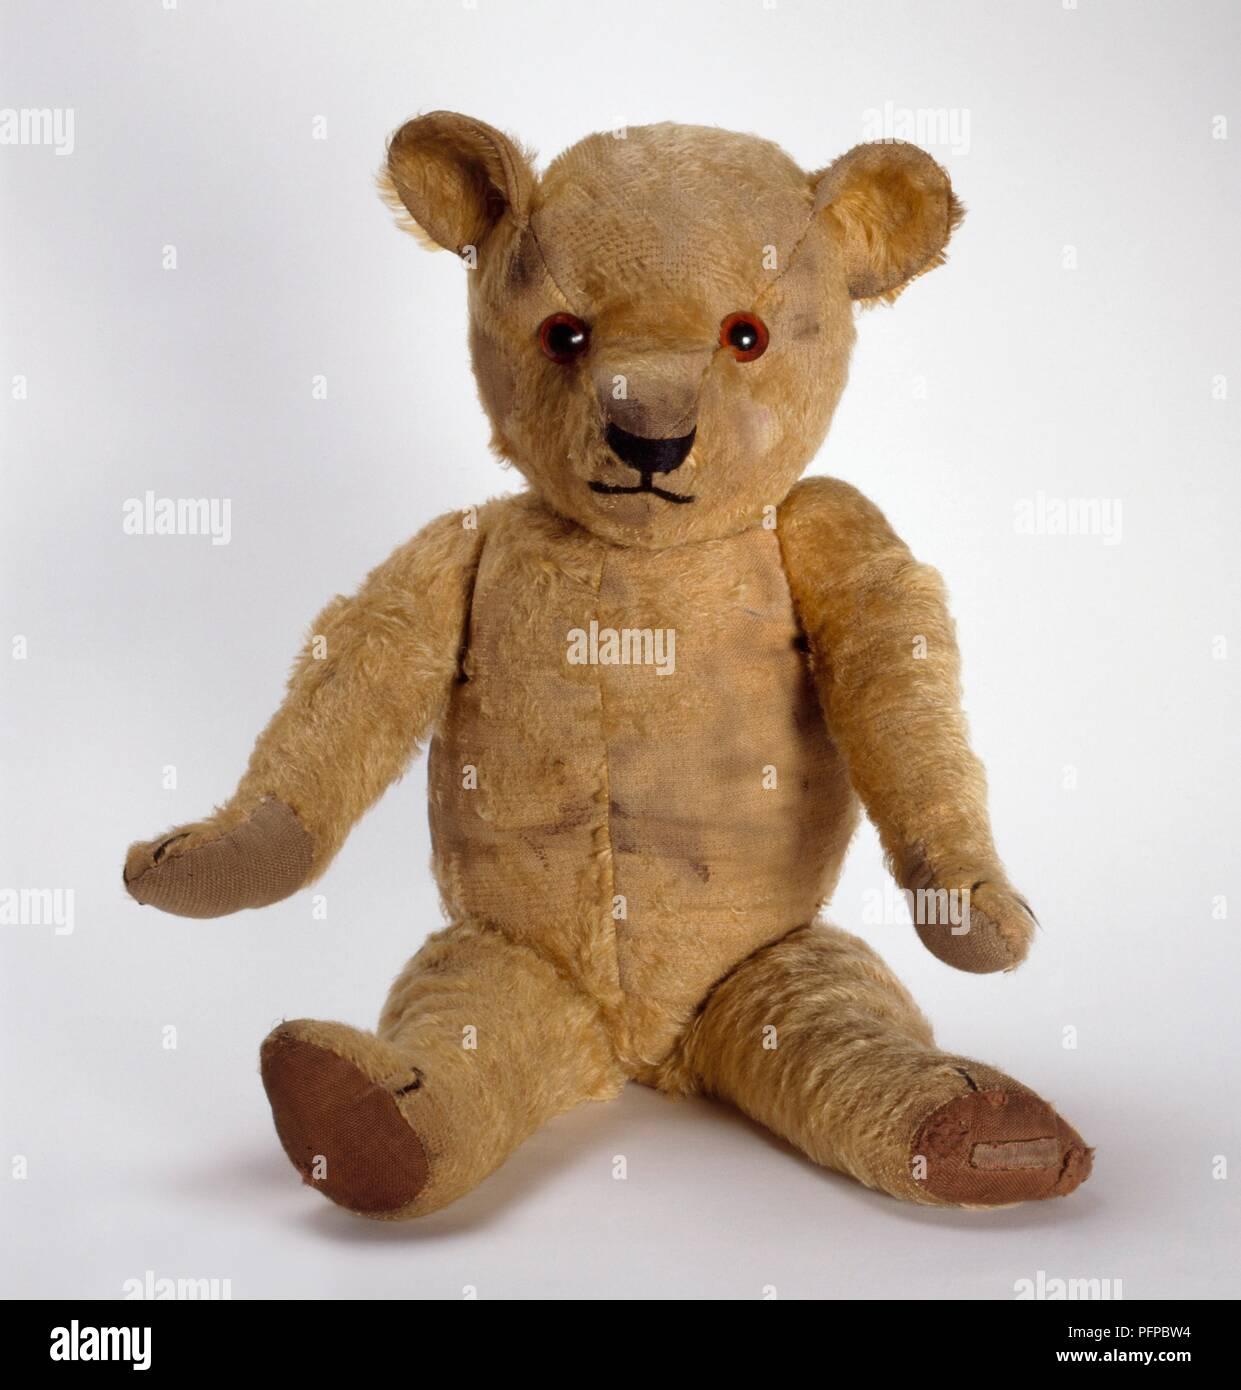 Rowan, 1930s, Chad Valley teddy bear - Stock Image